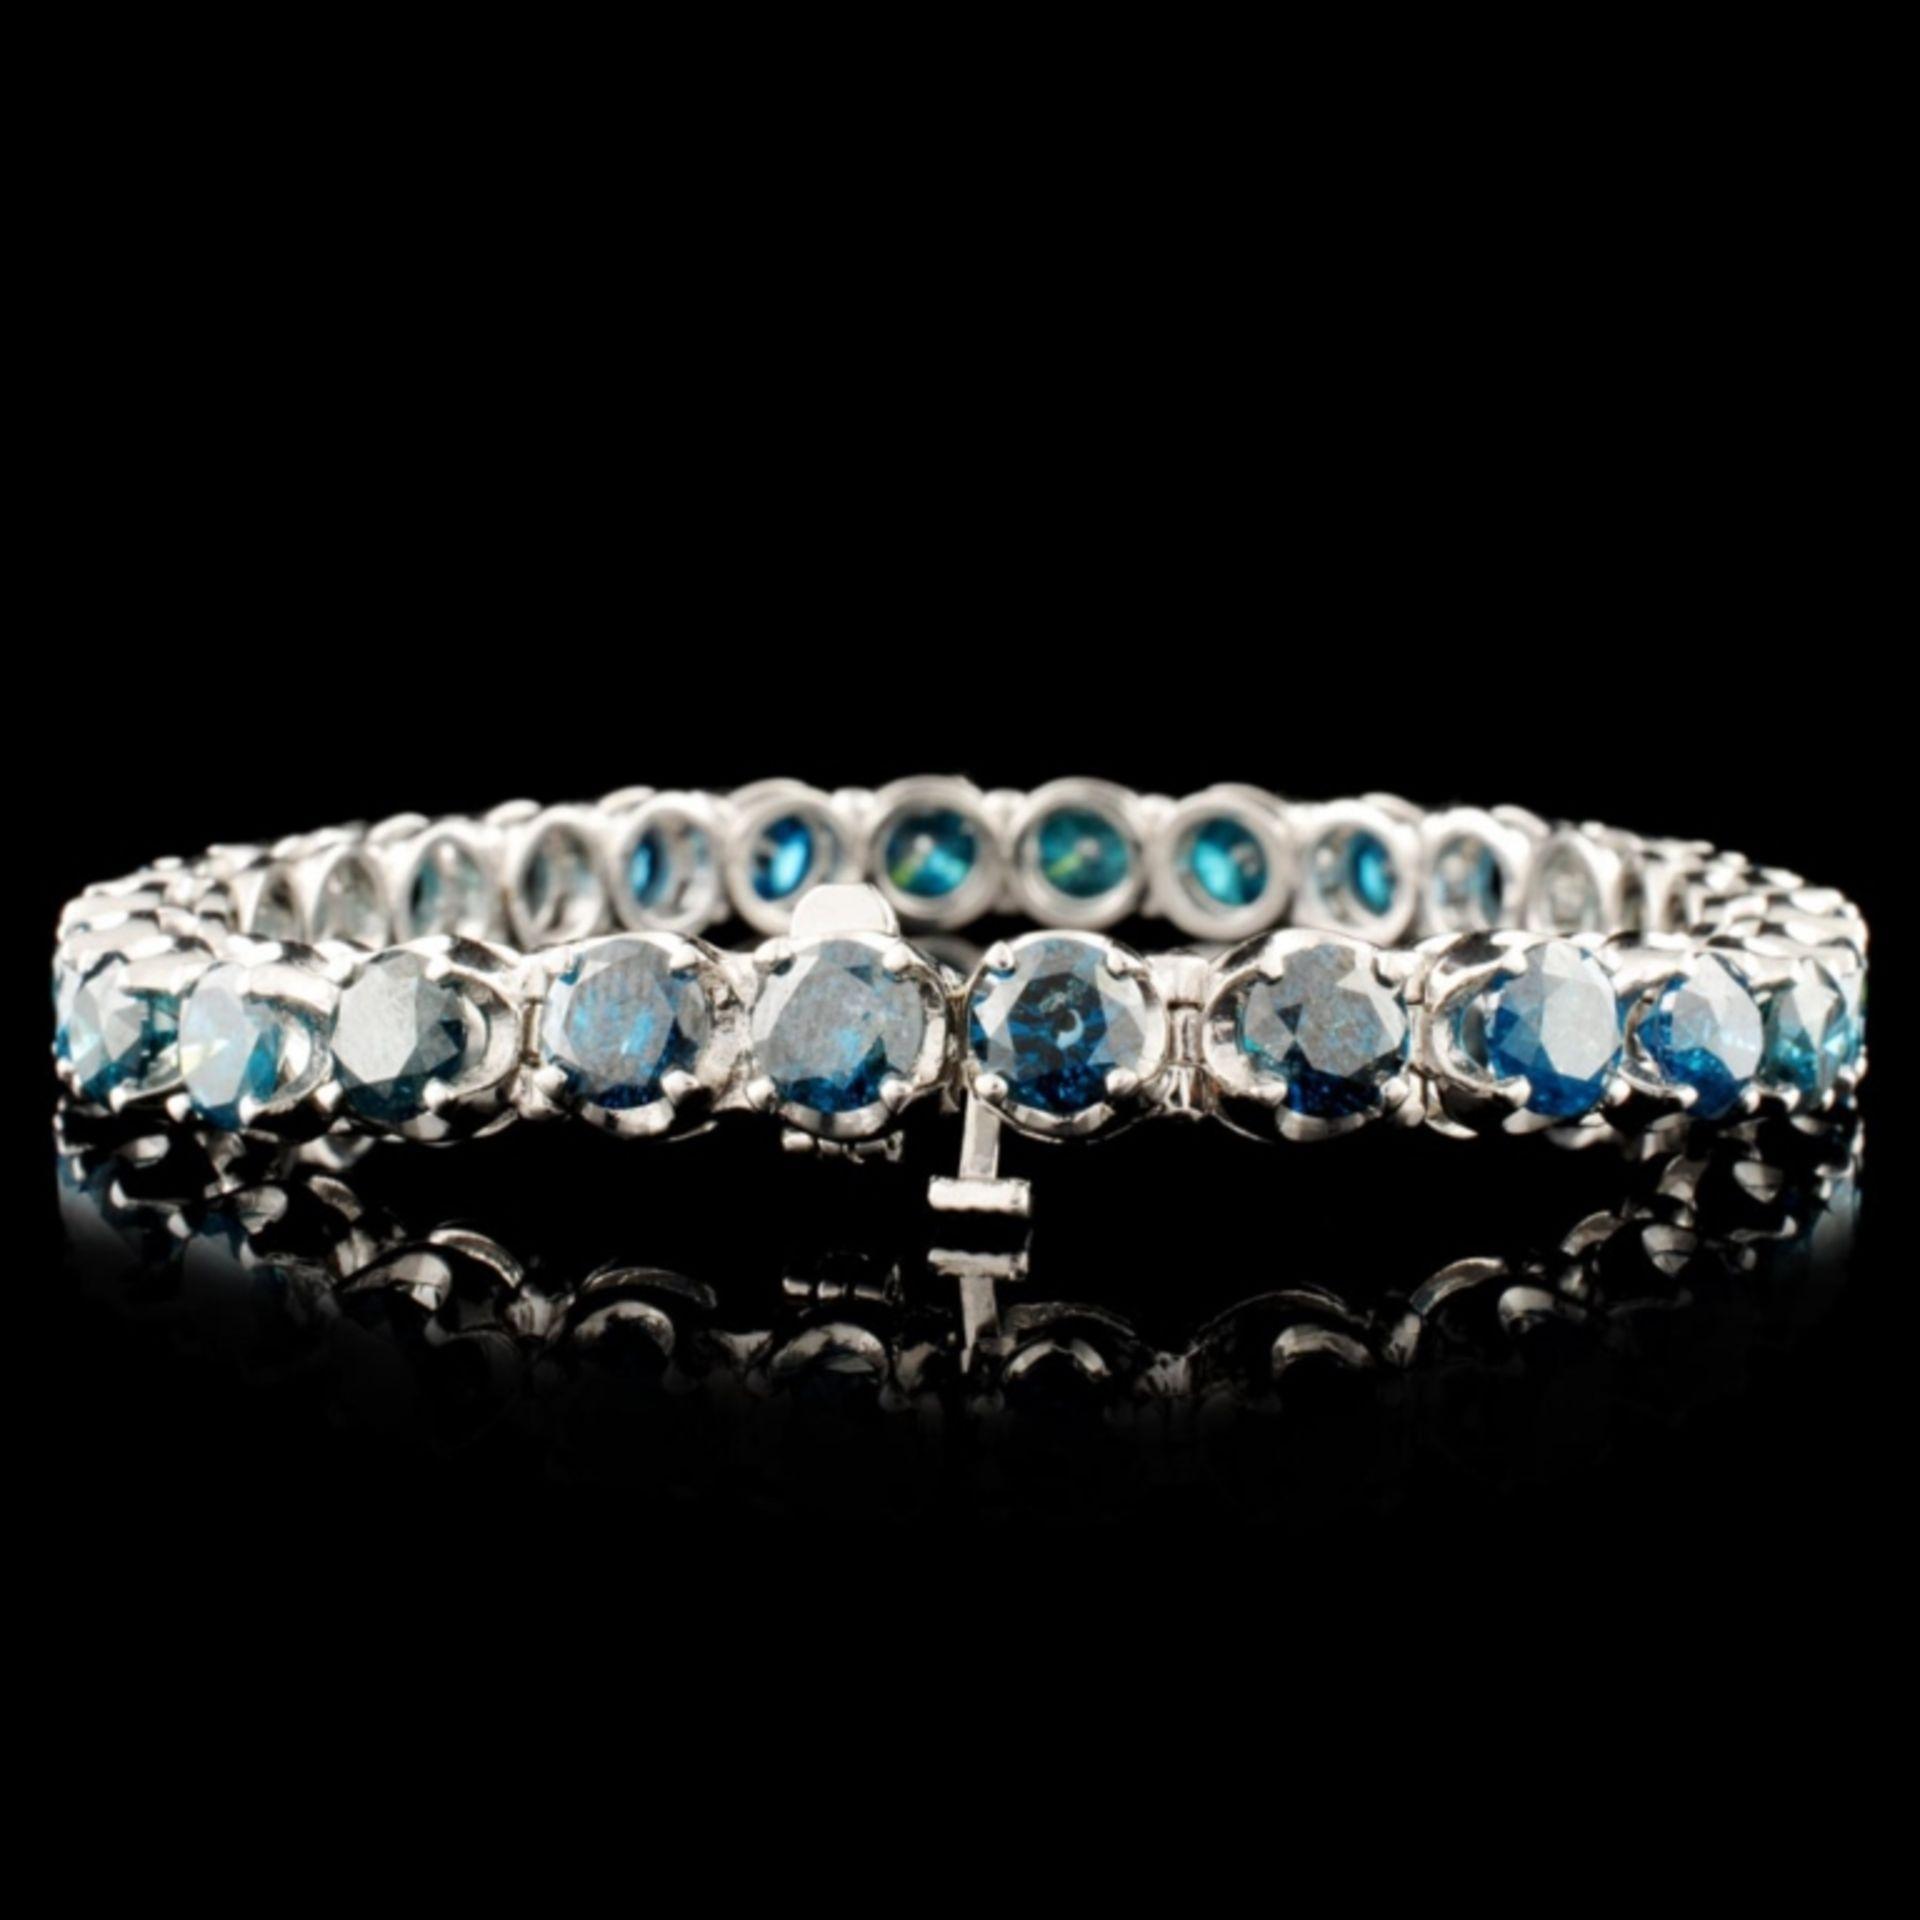 14K Gold 16.98ctw Tennis Diamond Bracelet - Image 2 of 4